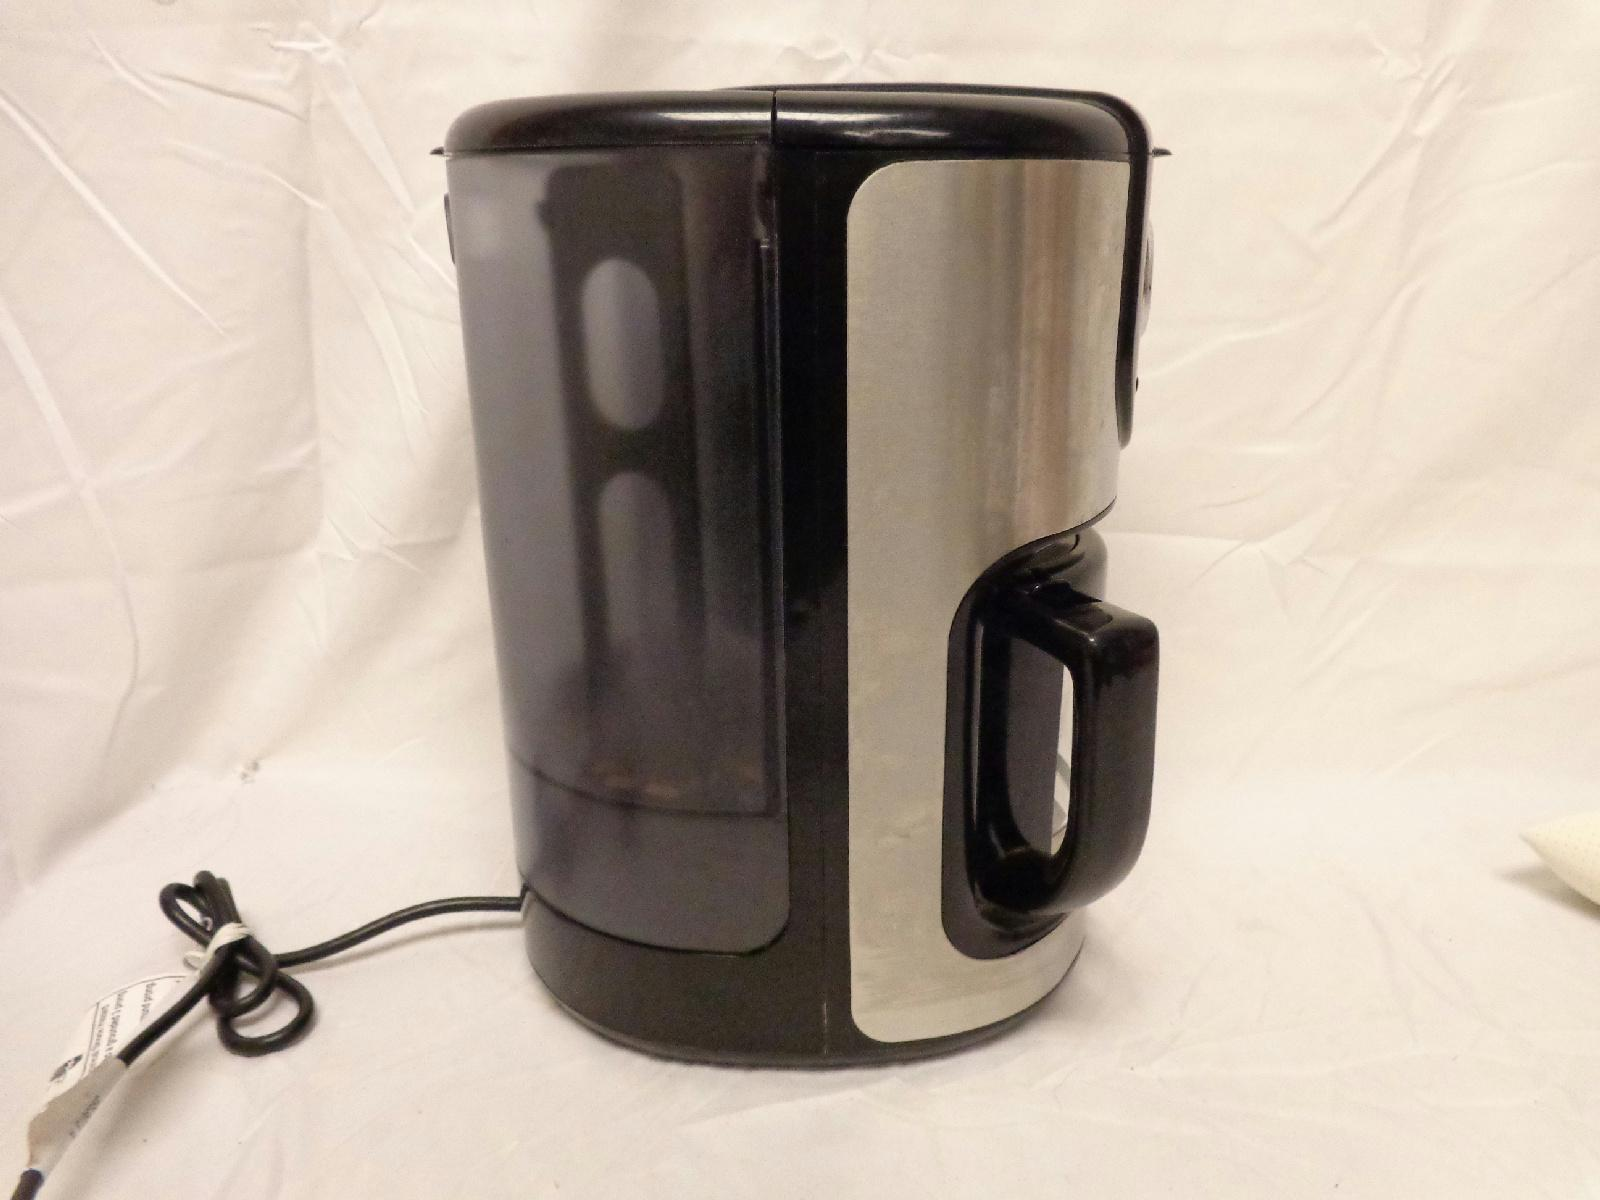 kitchenaid coffee maker kcm111ob manual